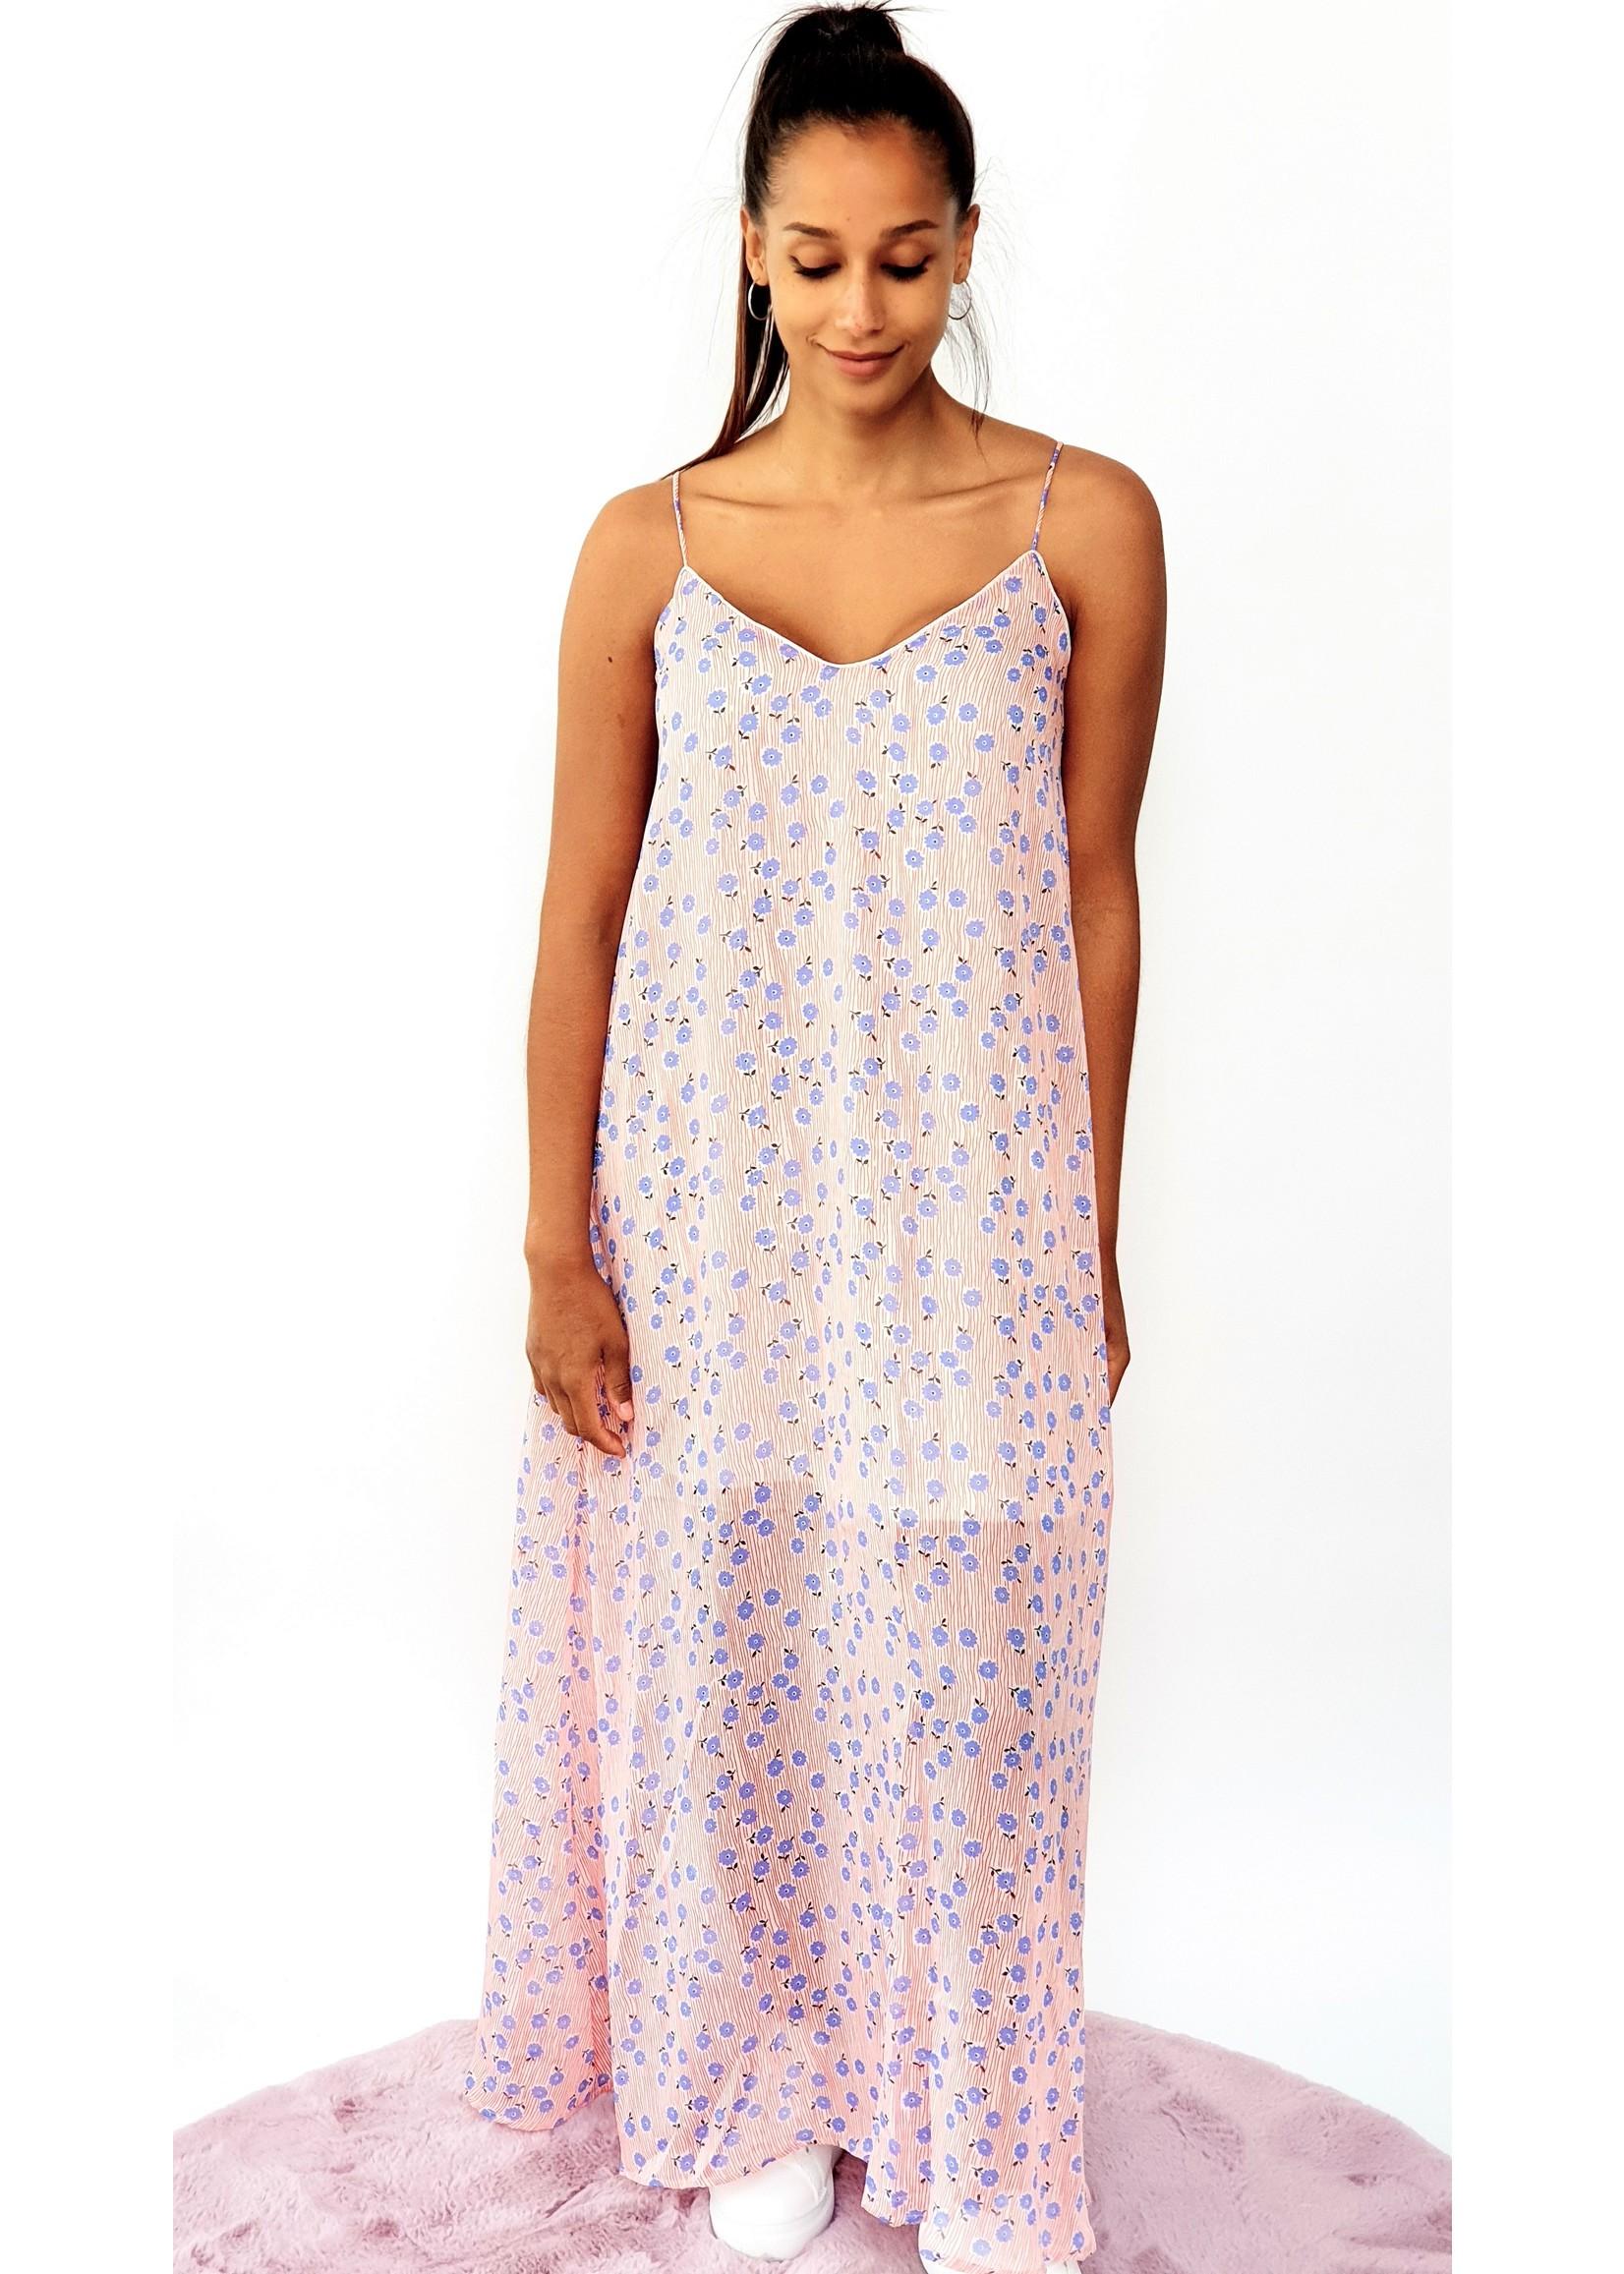 Thé silver blue flower dress